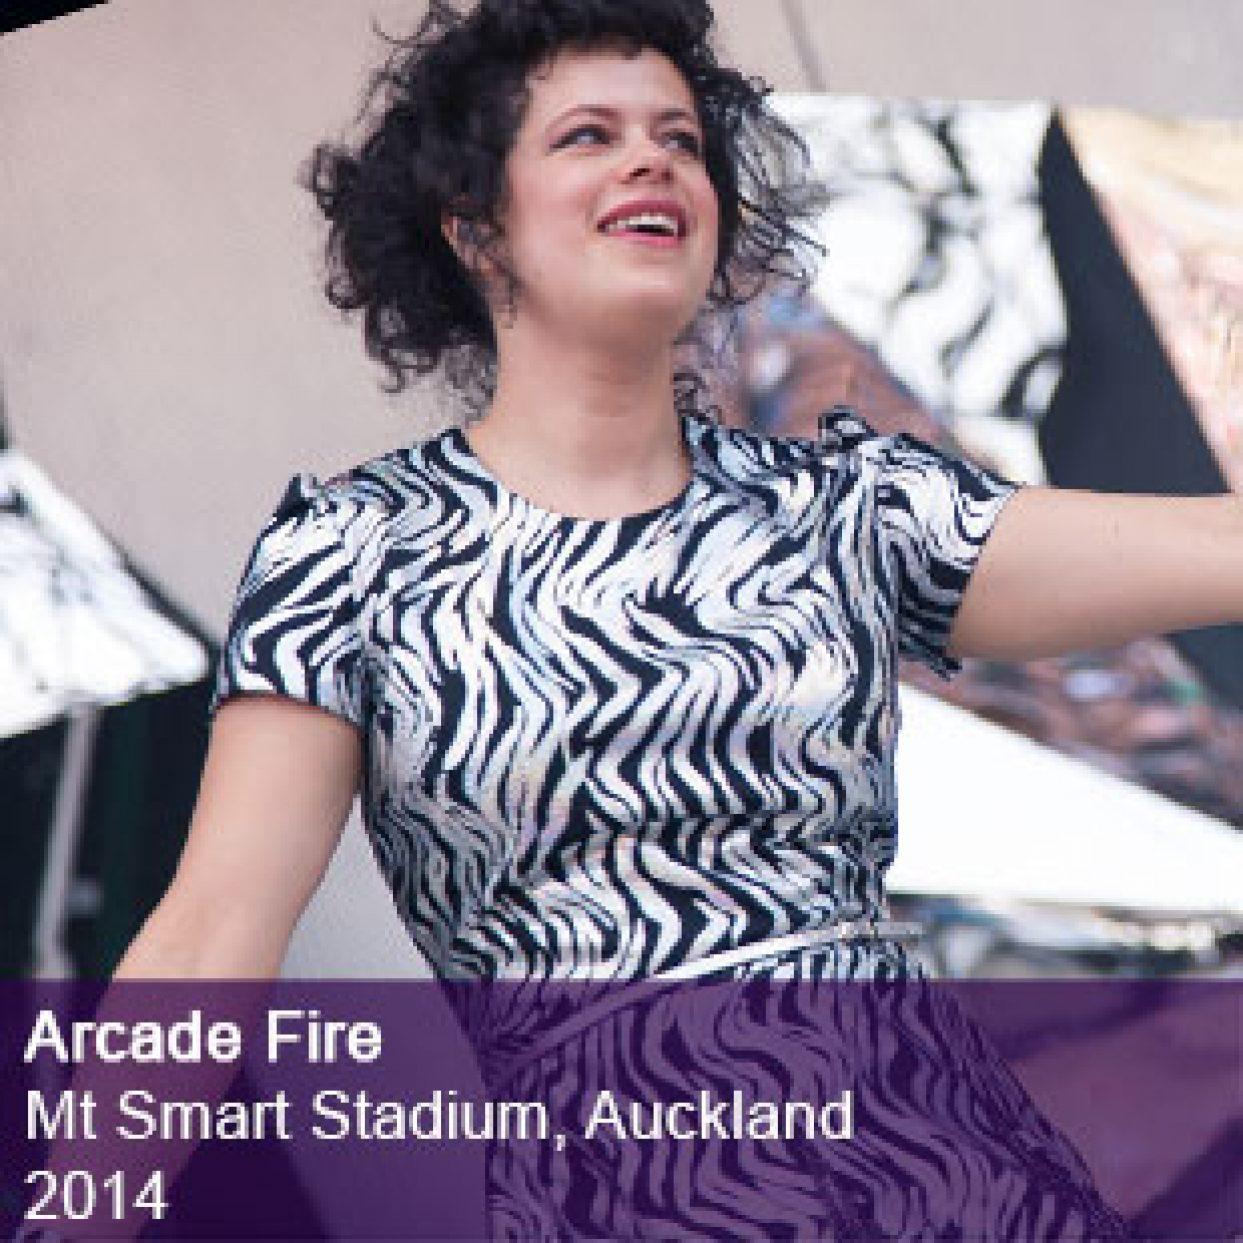 Arcade Fire live